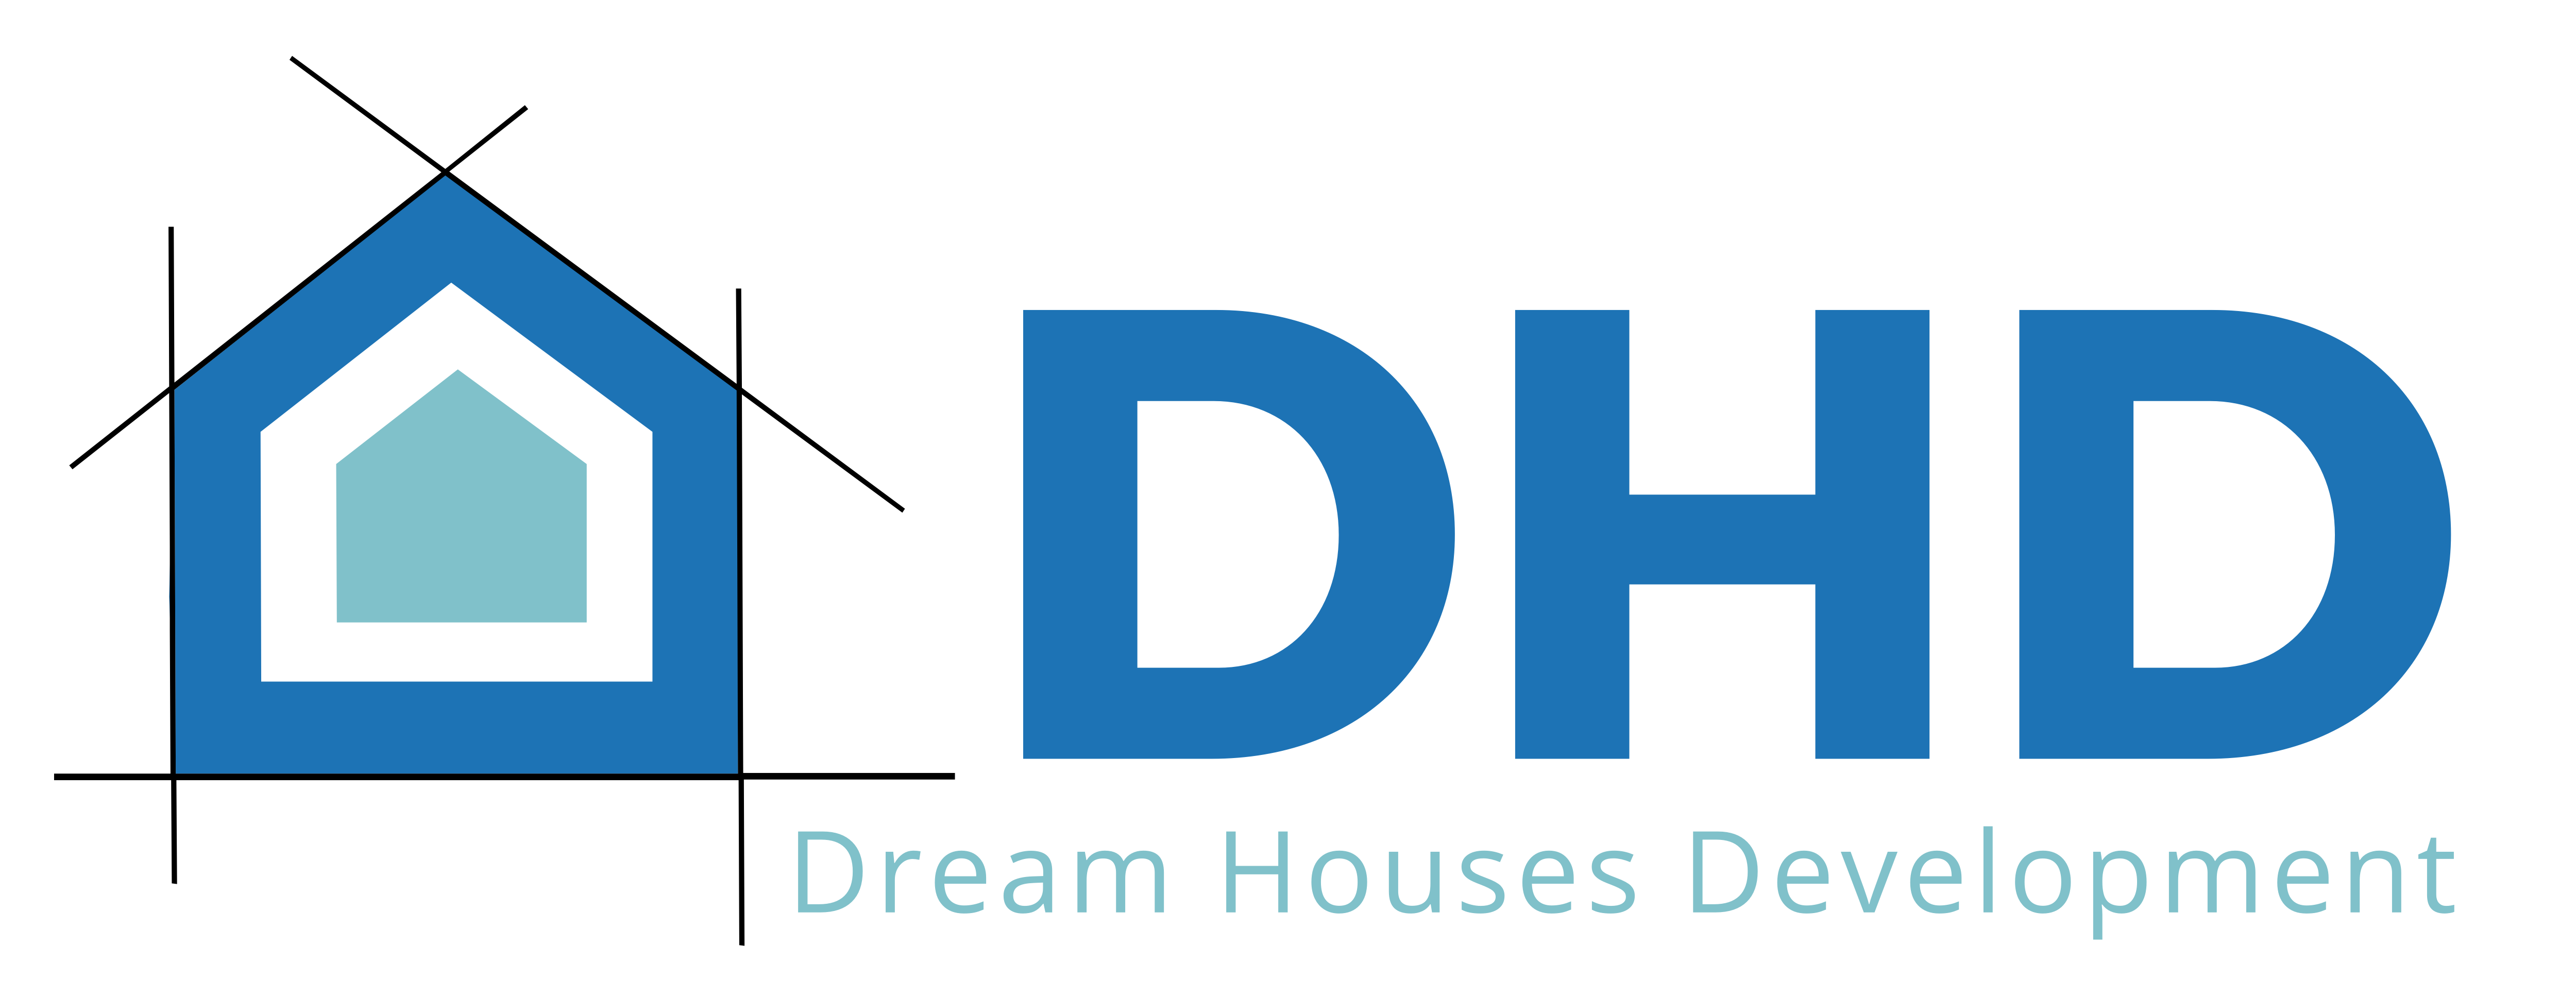 Dream Houses Development